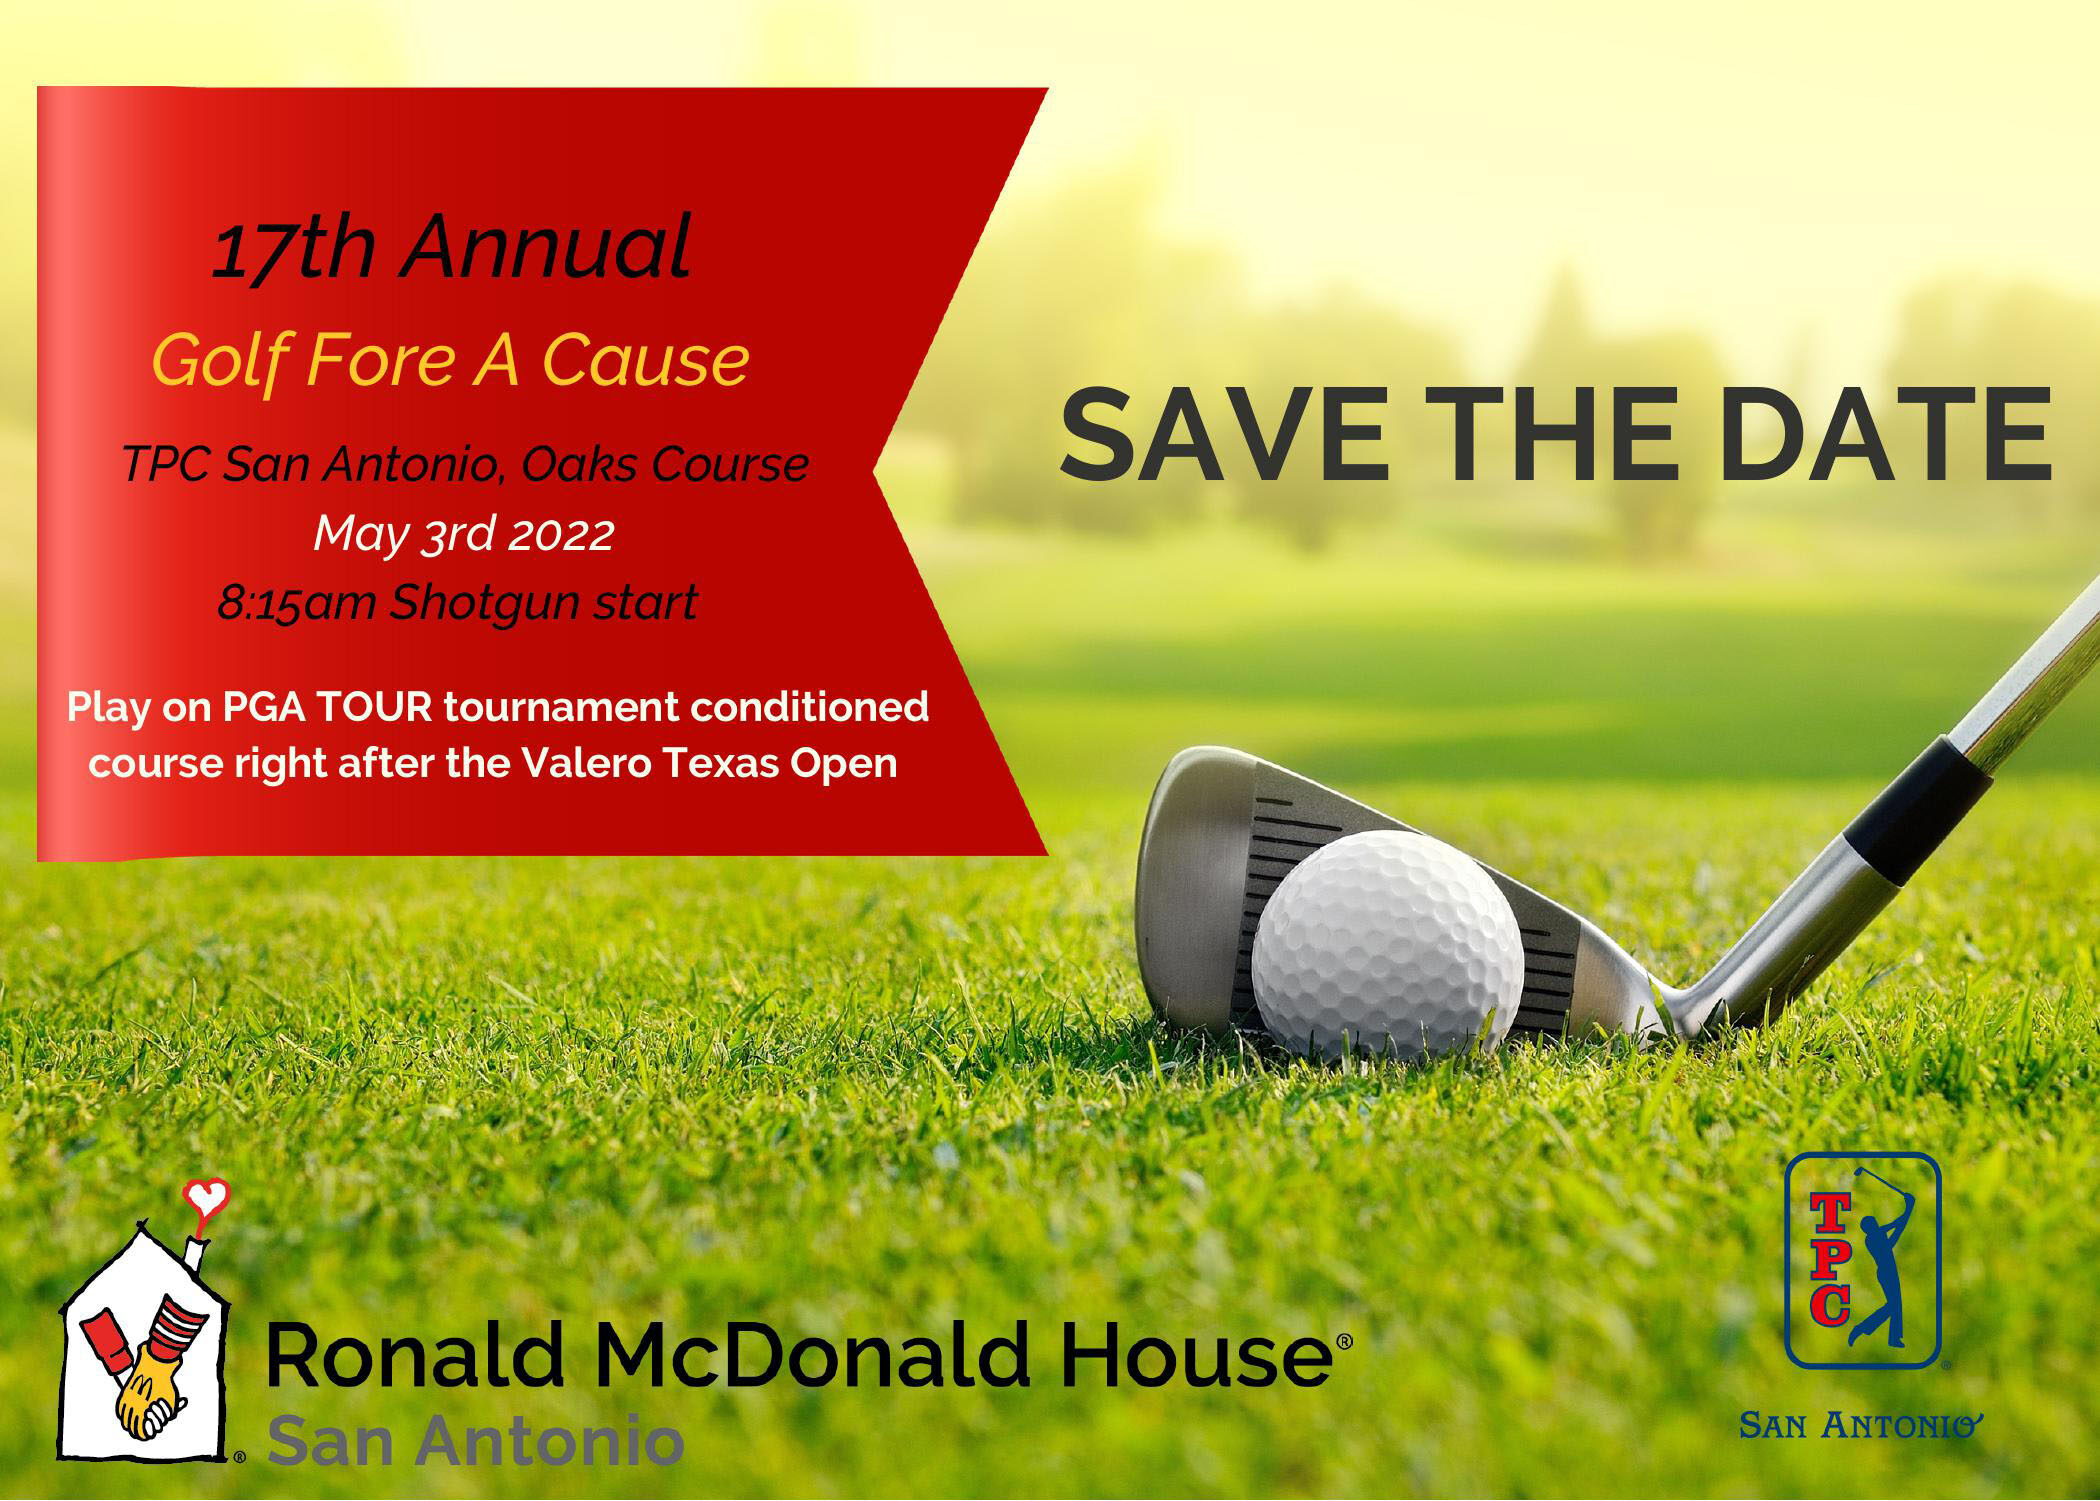 17th Annual Golf Fore A Cause